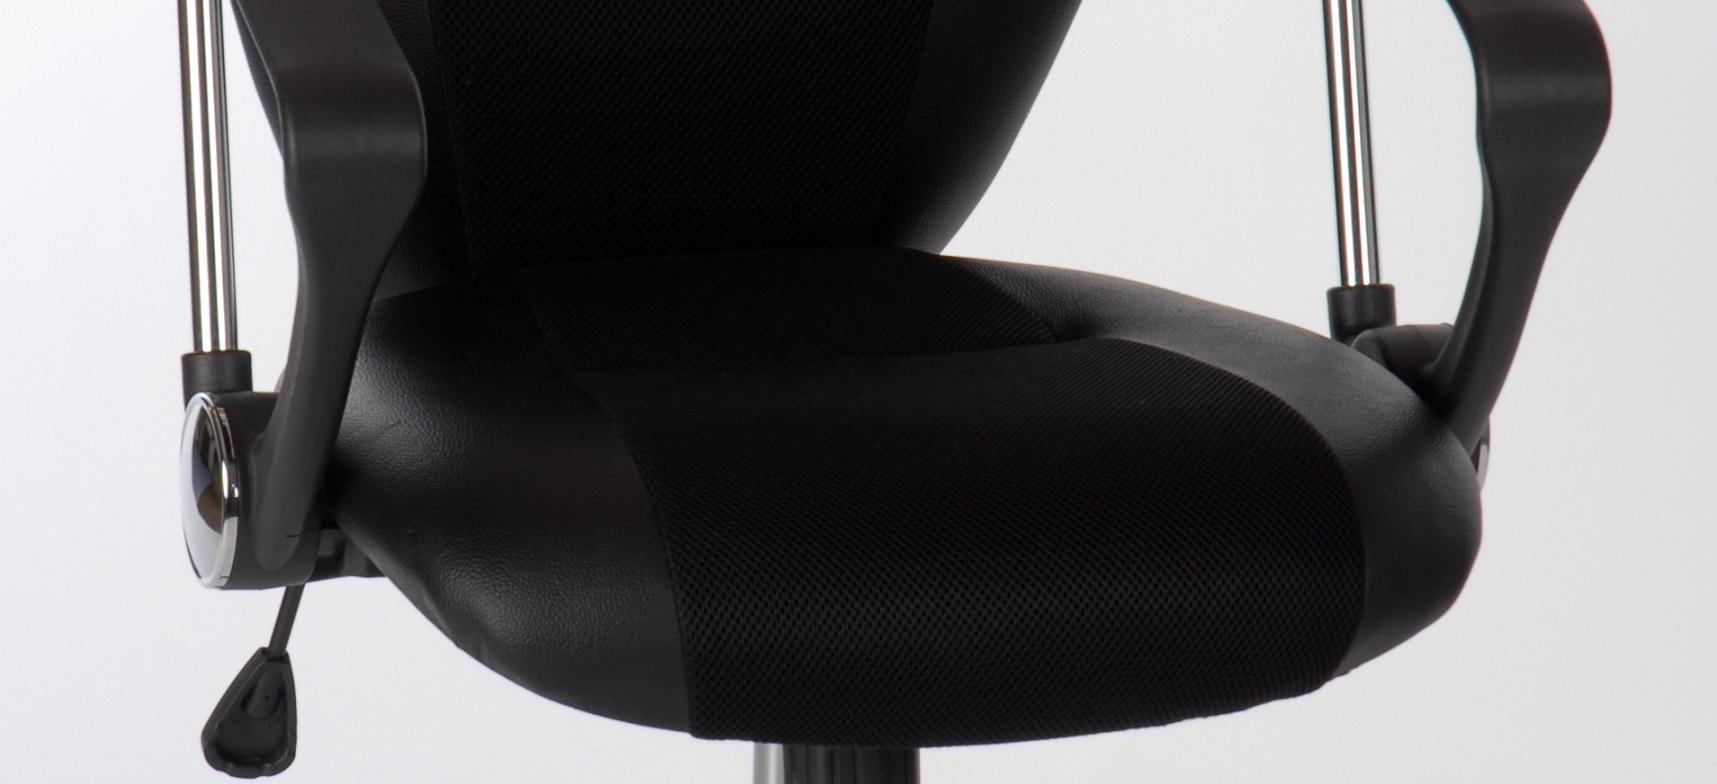 Bürostuhl Drehstuhl Schreibtischstuhl 60303S3 Drehstuhl Schwarz